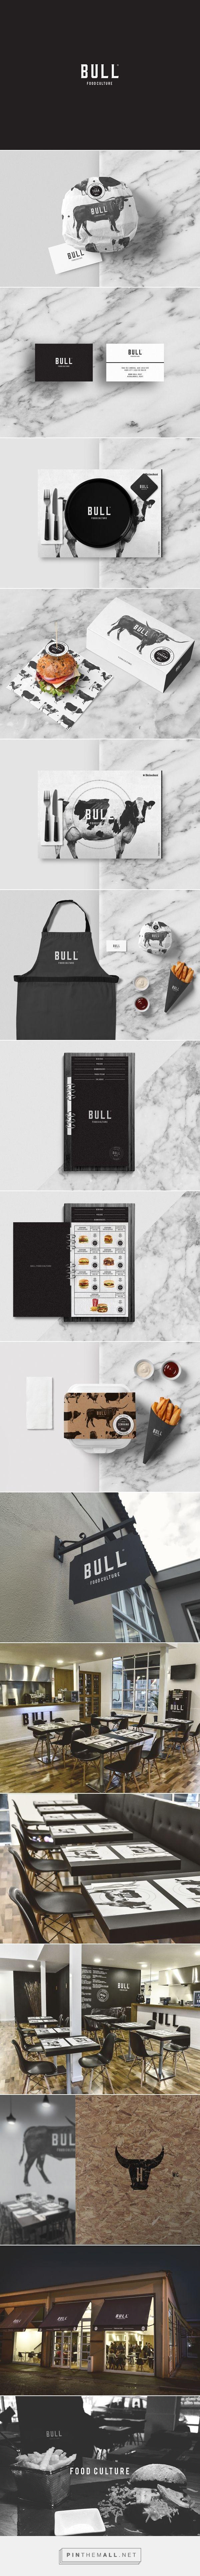 BULL Food Culture Restaurant Branding and Menu Design by Bullseye